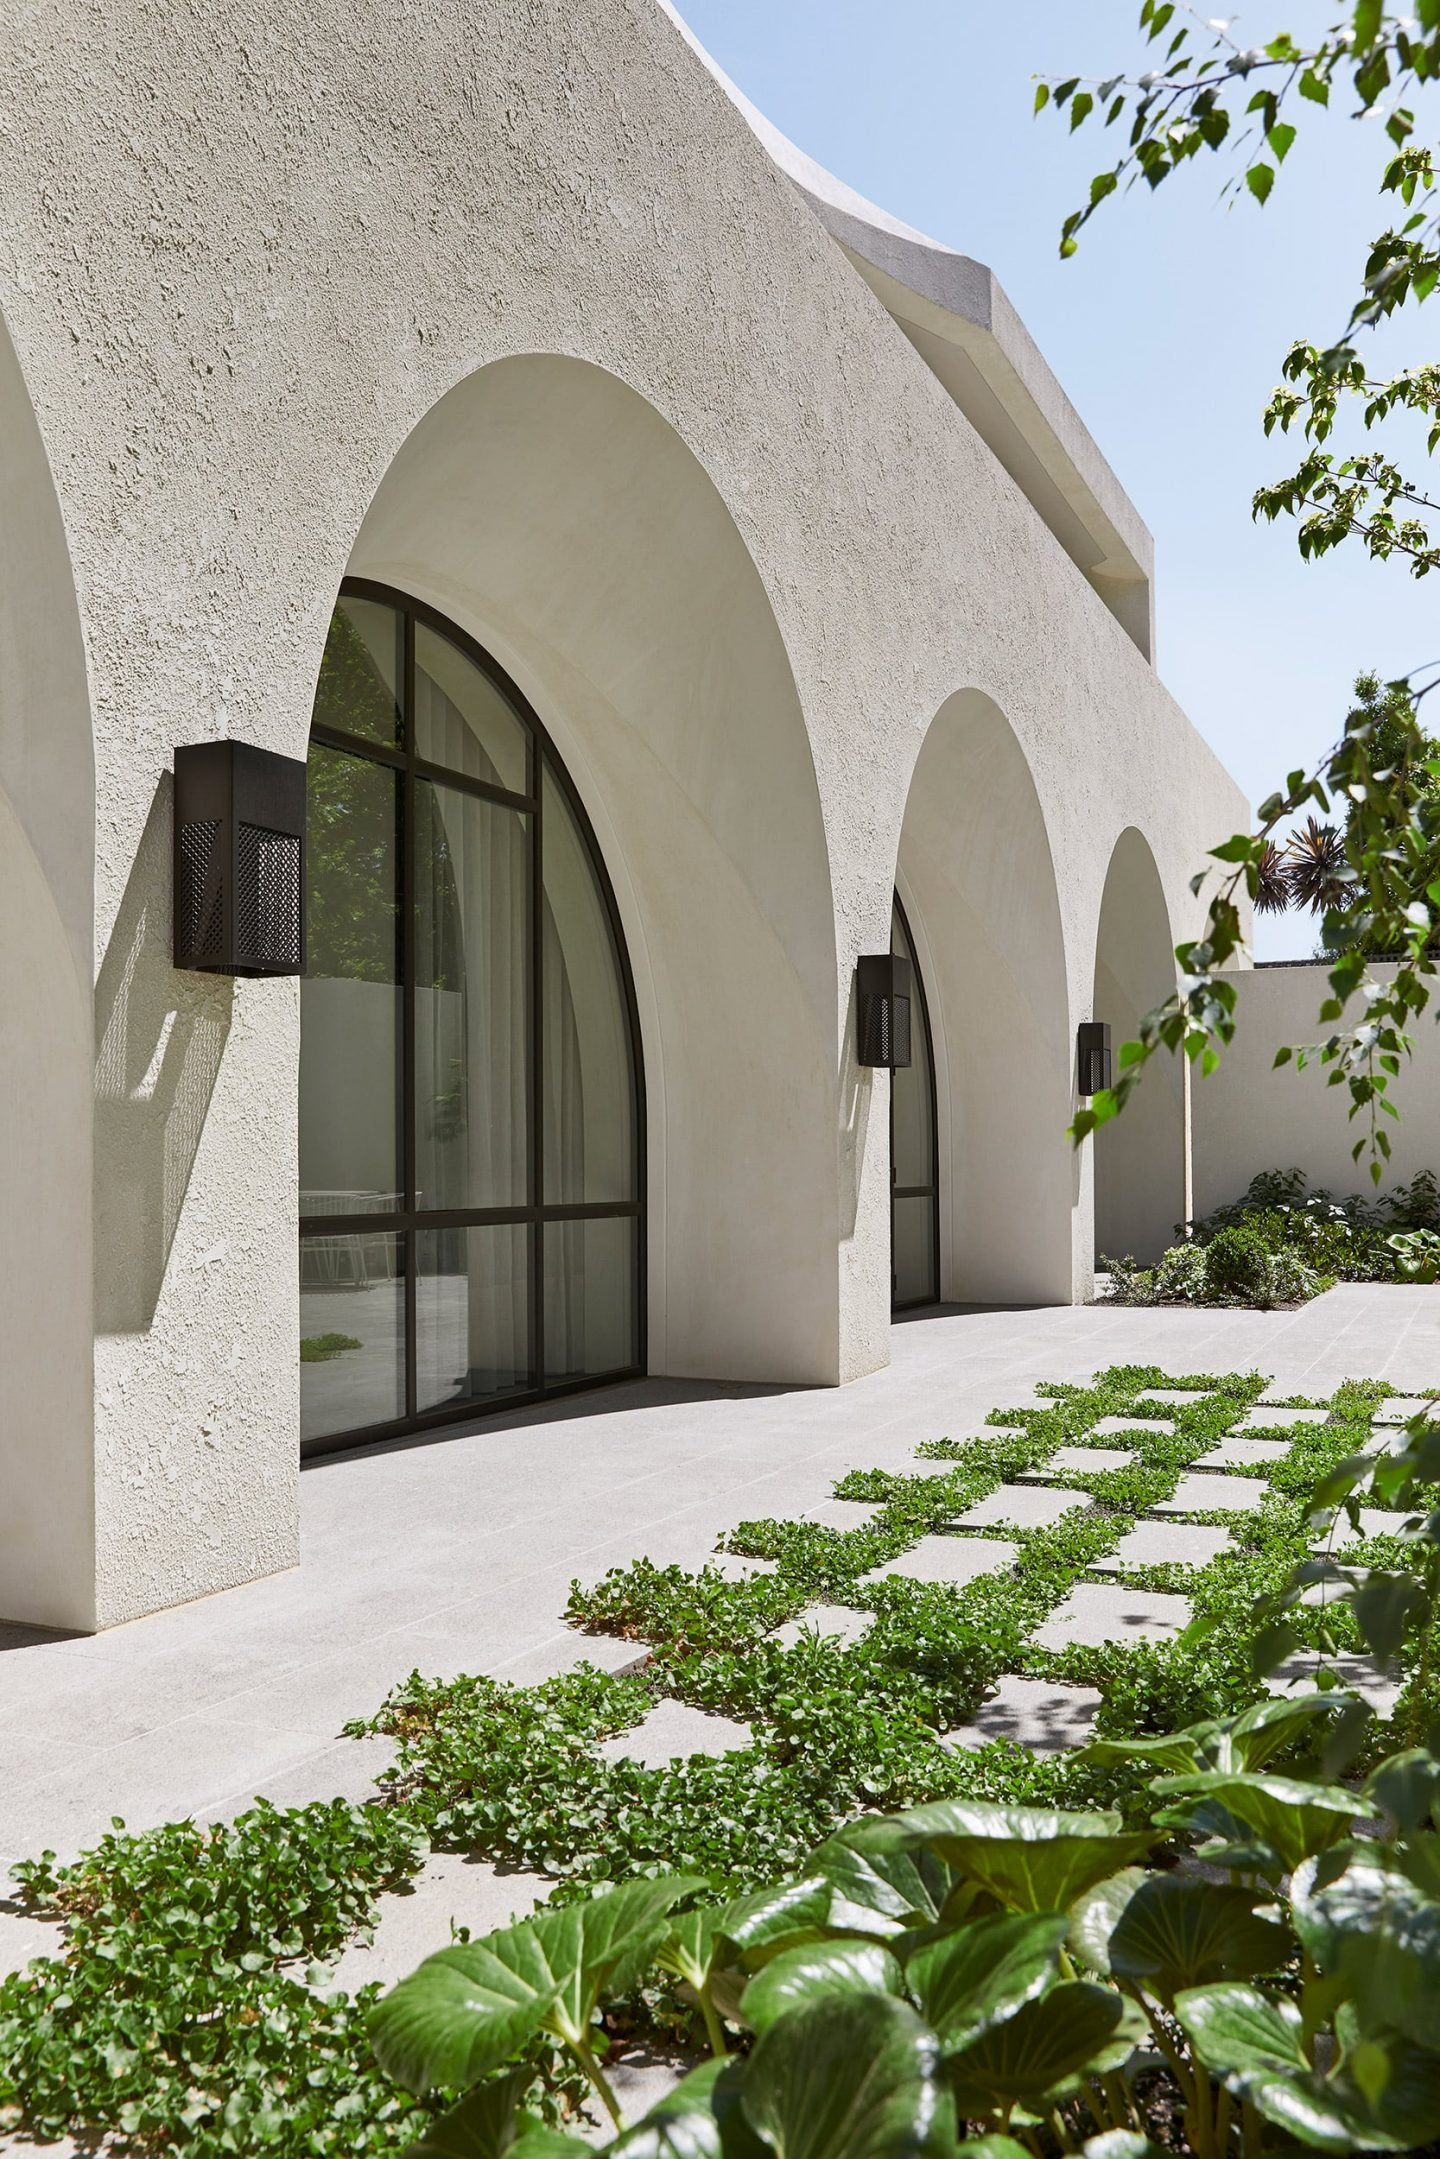 IGNANT-Architecture-Jolson-Huntingtower-Road-03